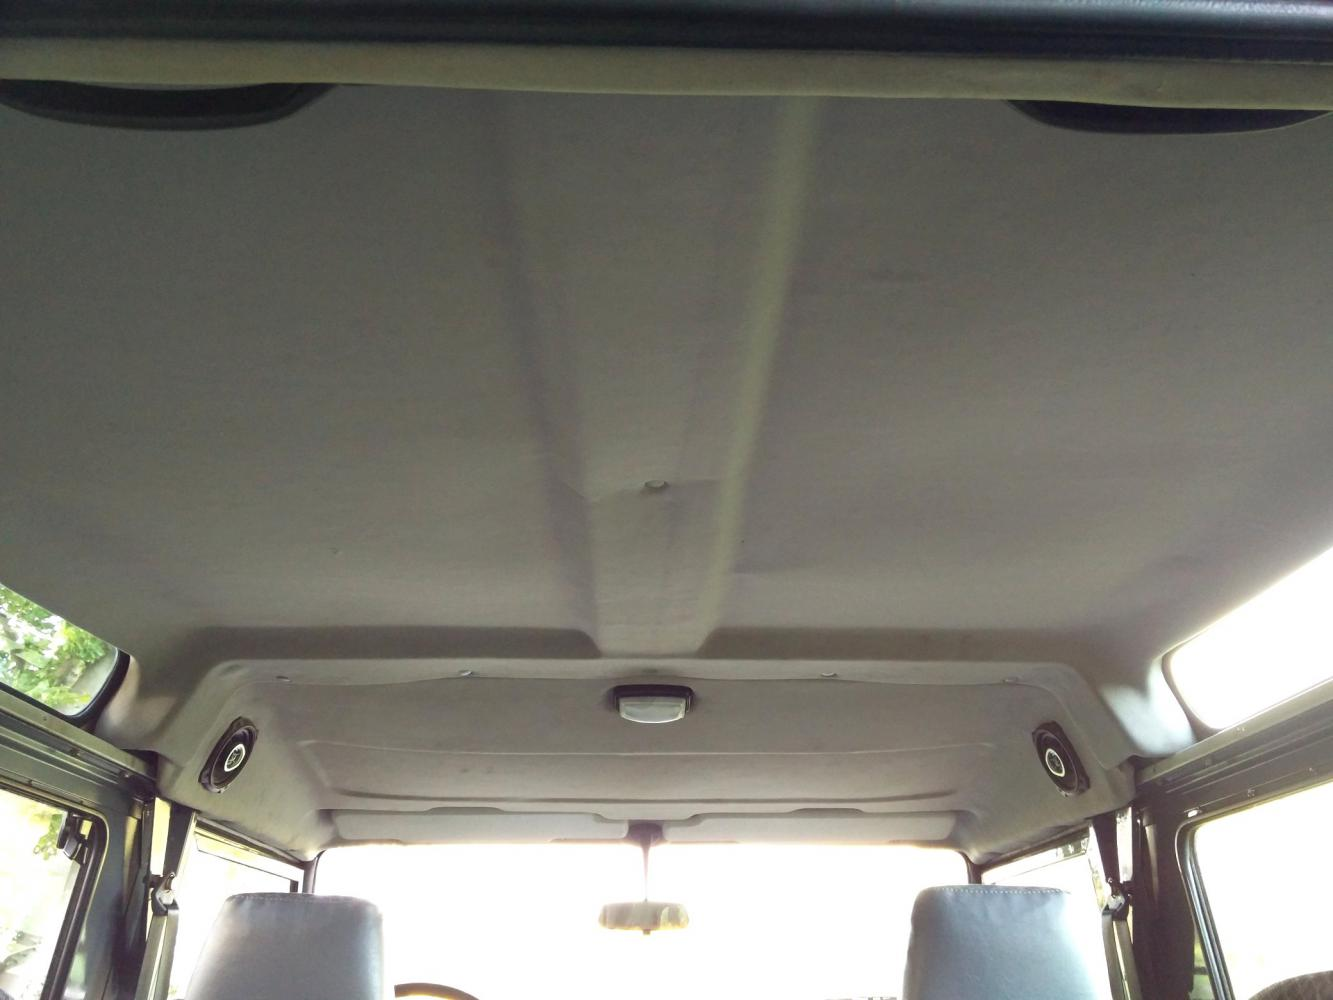 Click image for larger version  Name:1992 LR LHD Defender 90 200 Tdi Grey B interior headliner.jpg Views:109 Size:86.1 KB ID:320537